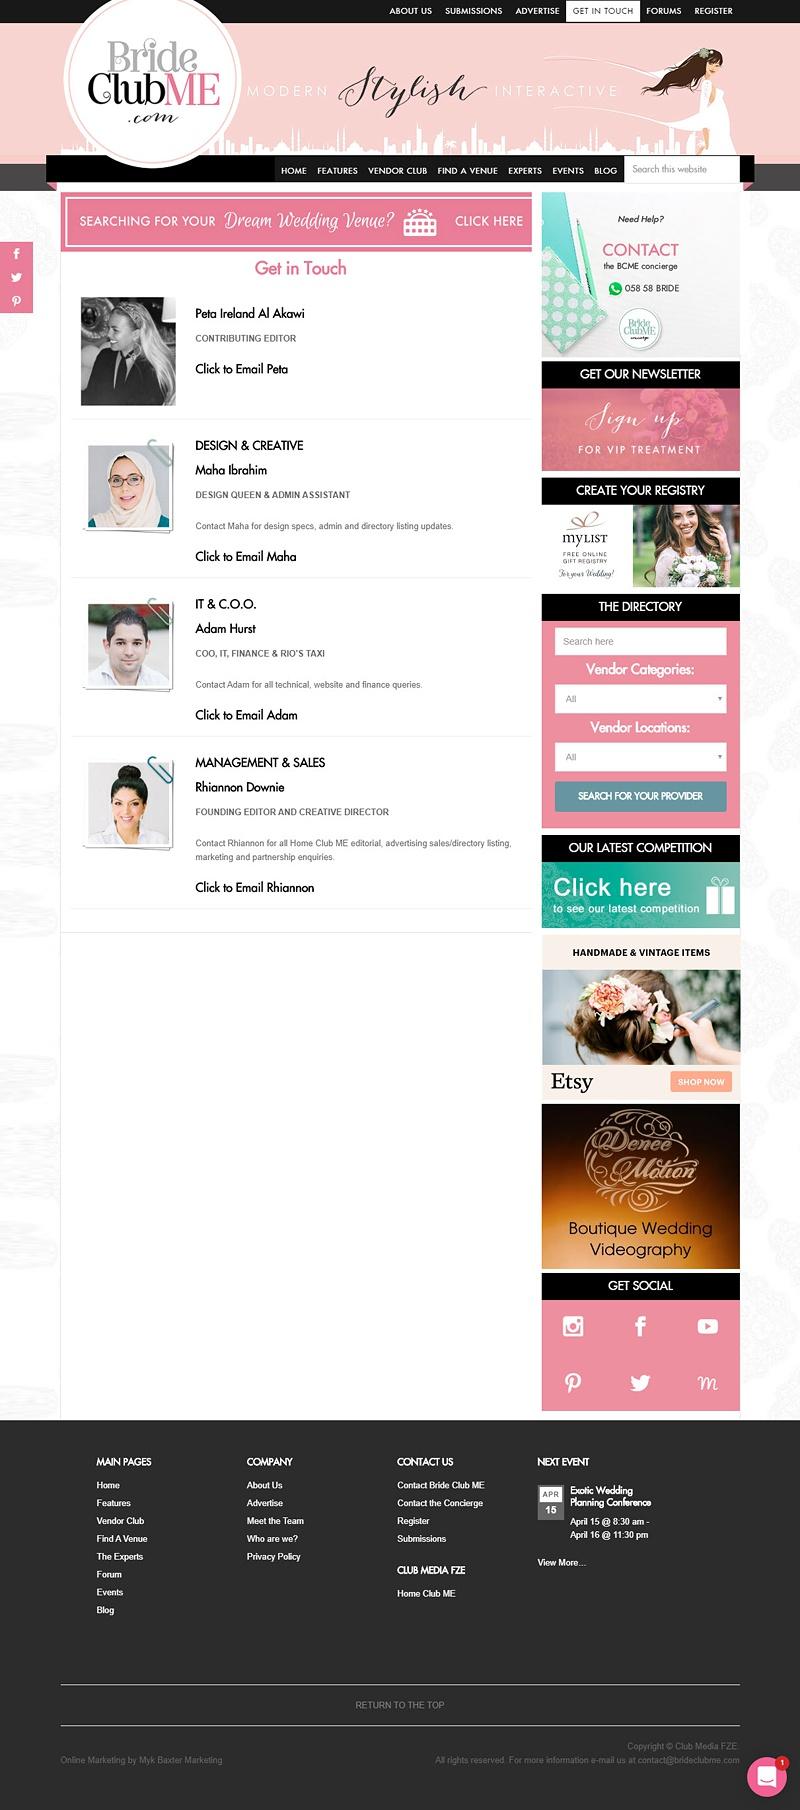 BrideClubMe Contact